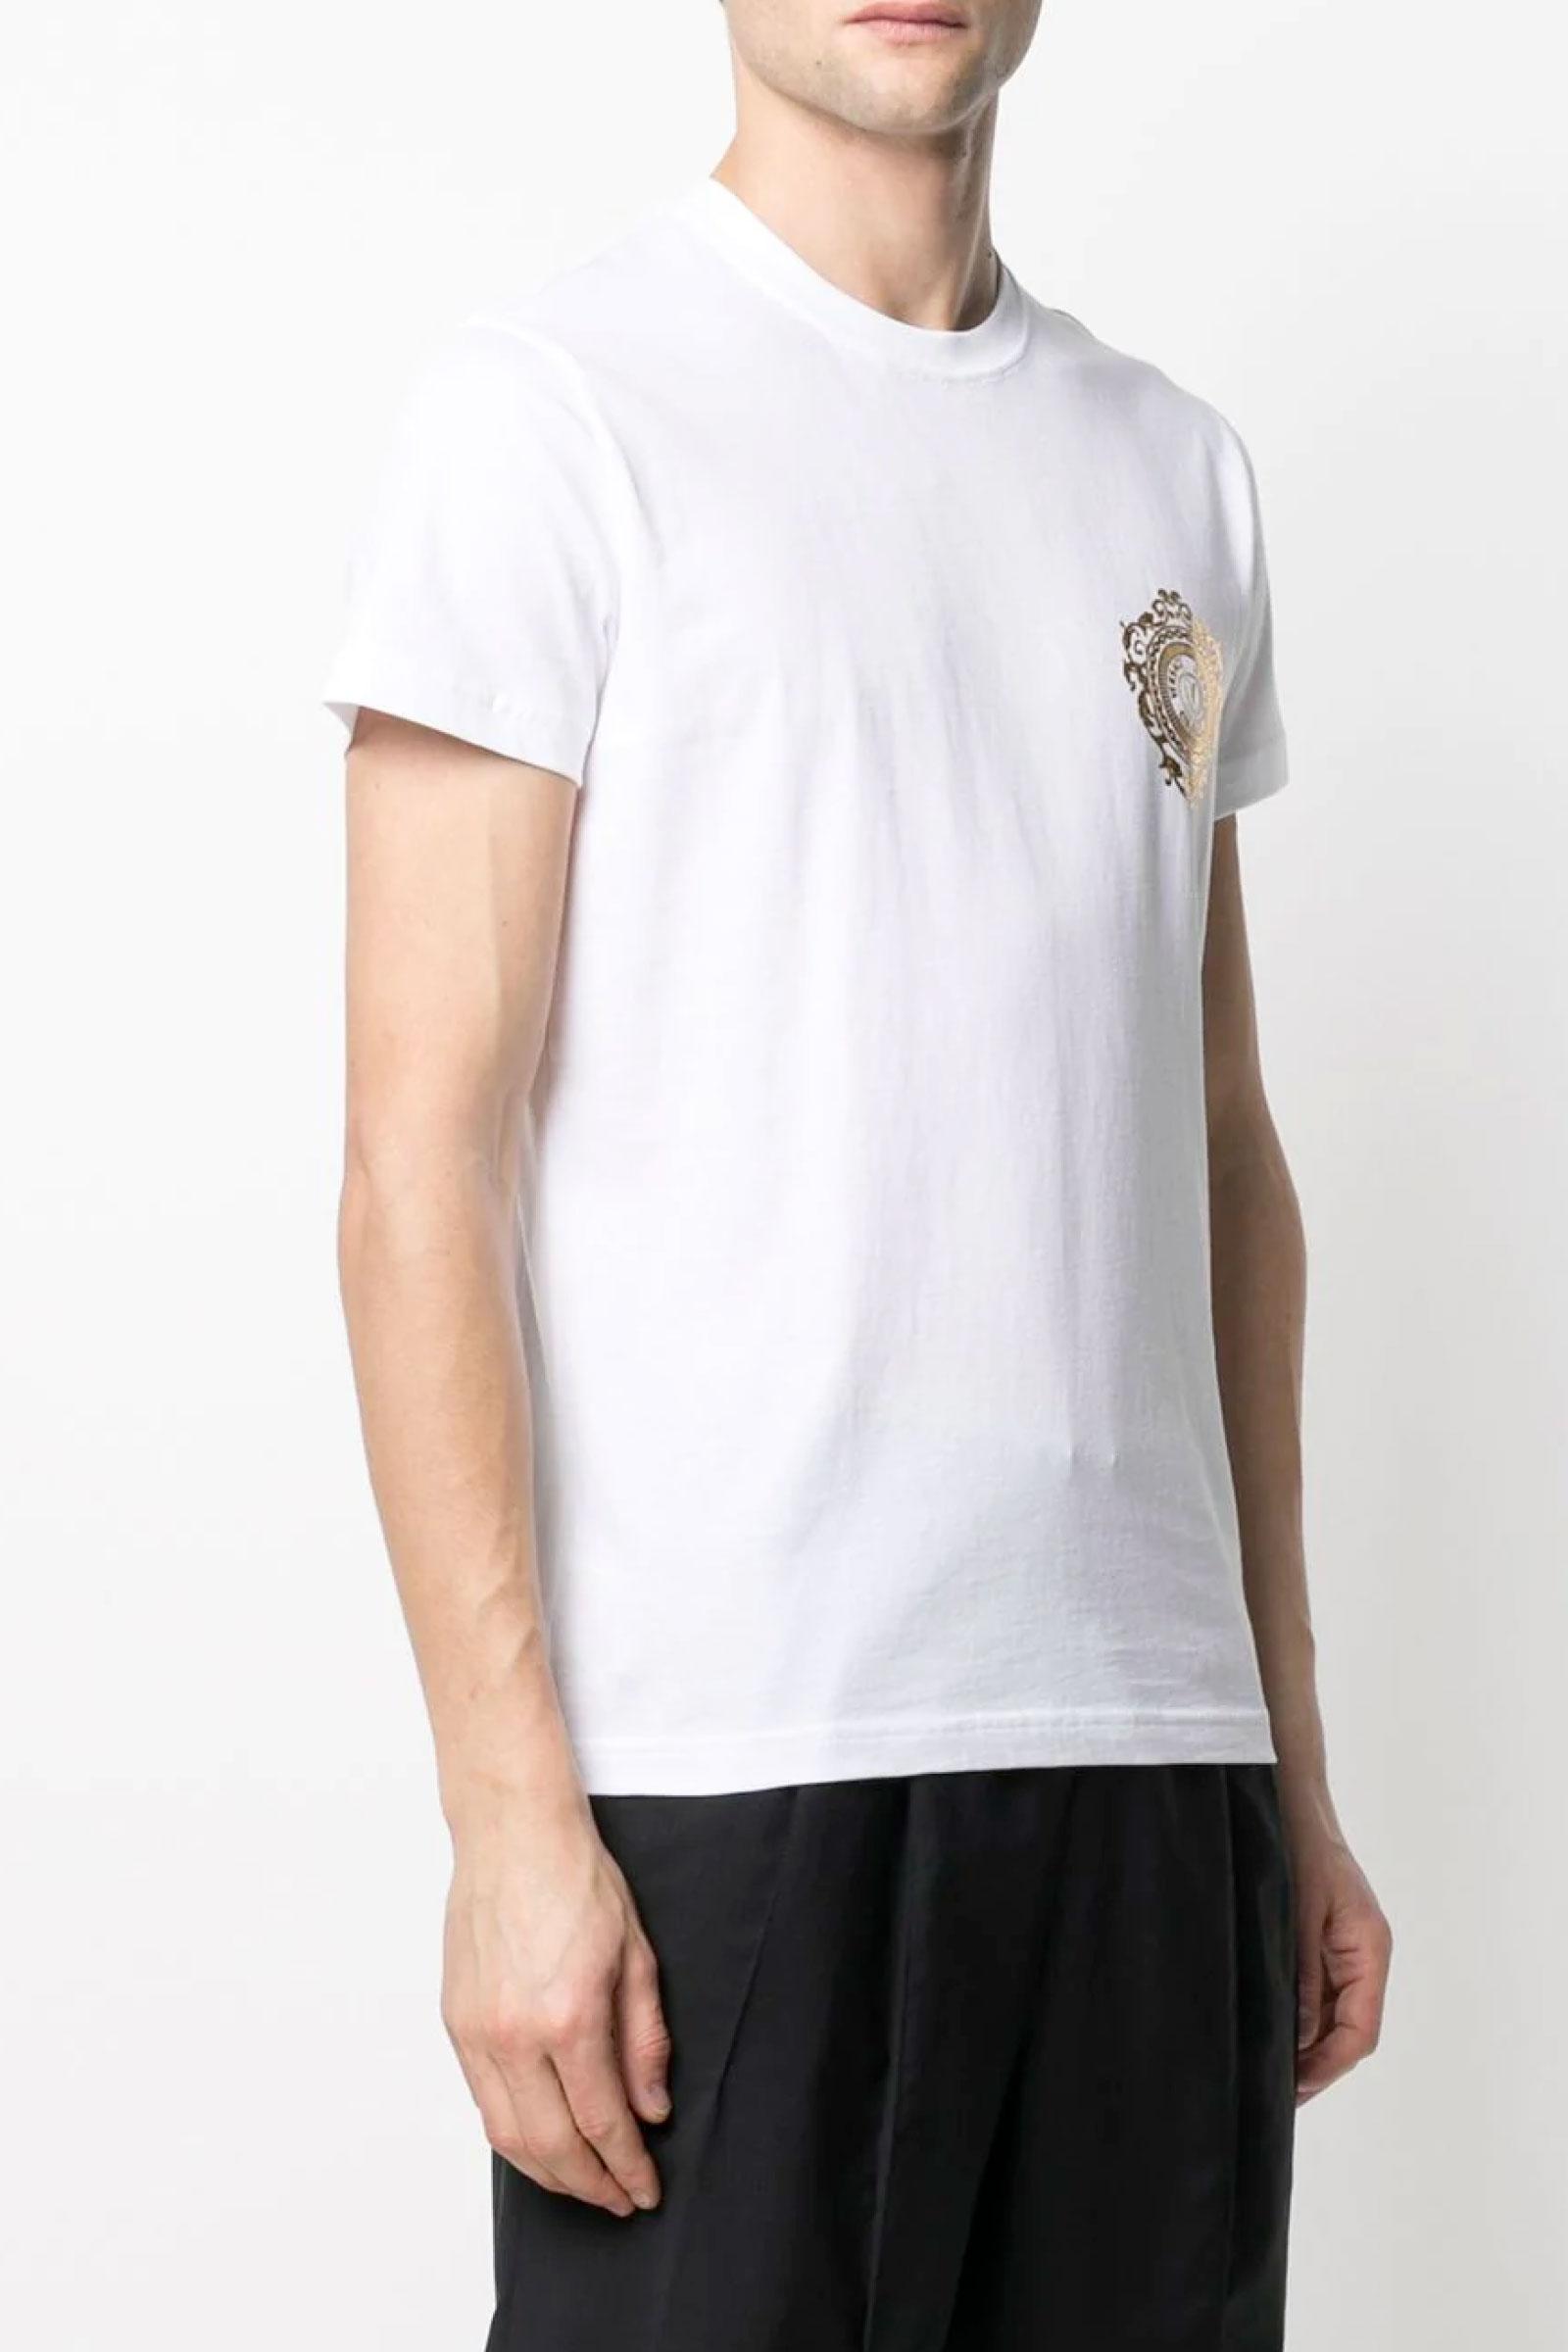 VERSACE JEANS COUTURE Men's T-Shirt VERSACE JEANS COUTURE | T-Shirt | B3GWA71F30454K41